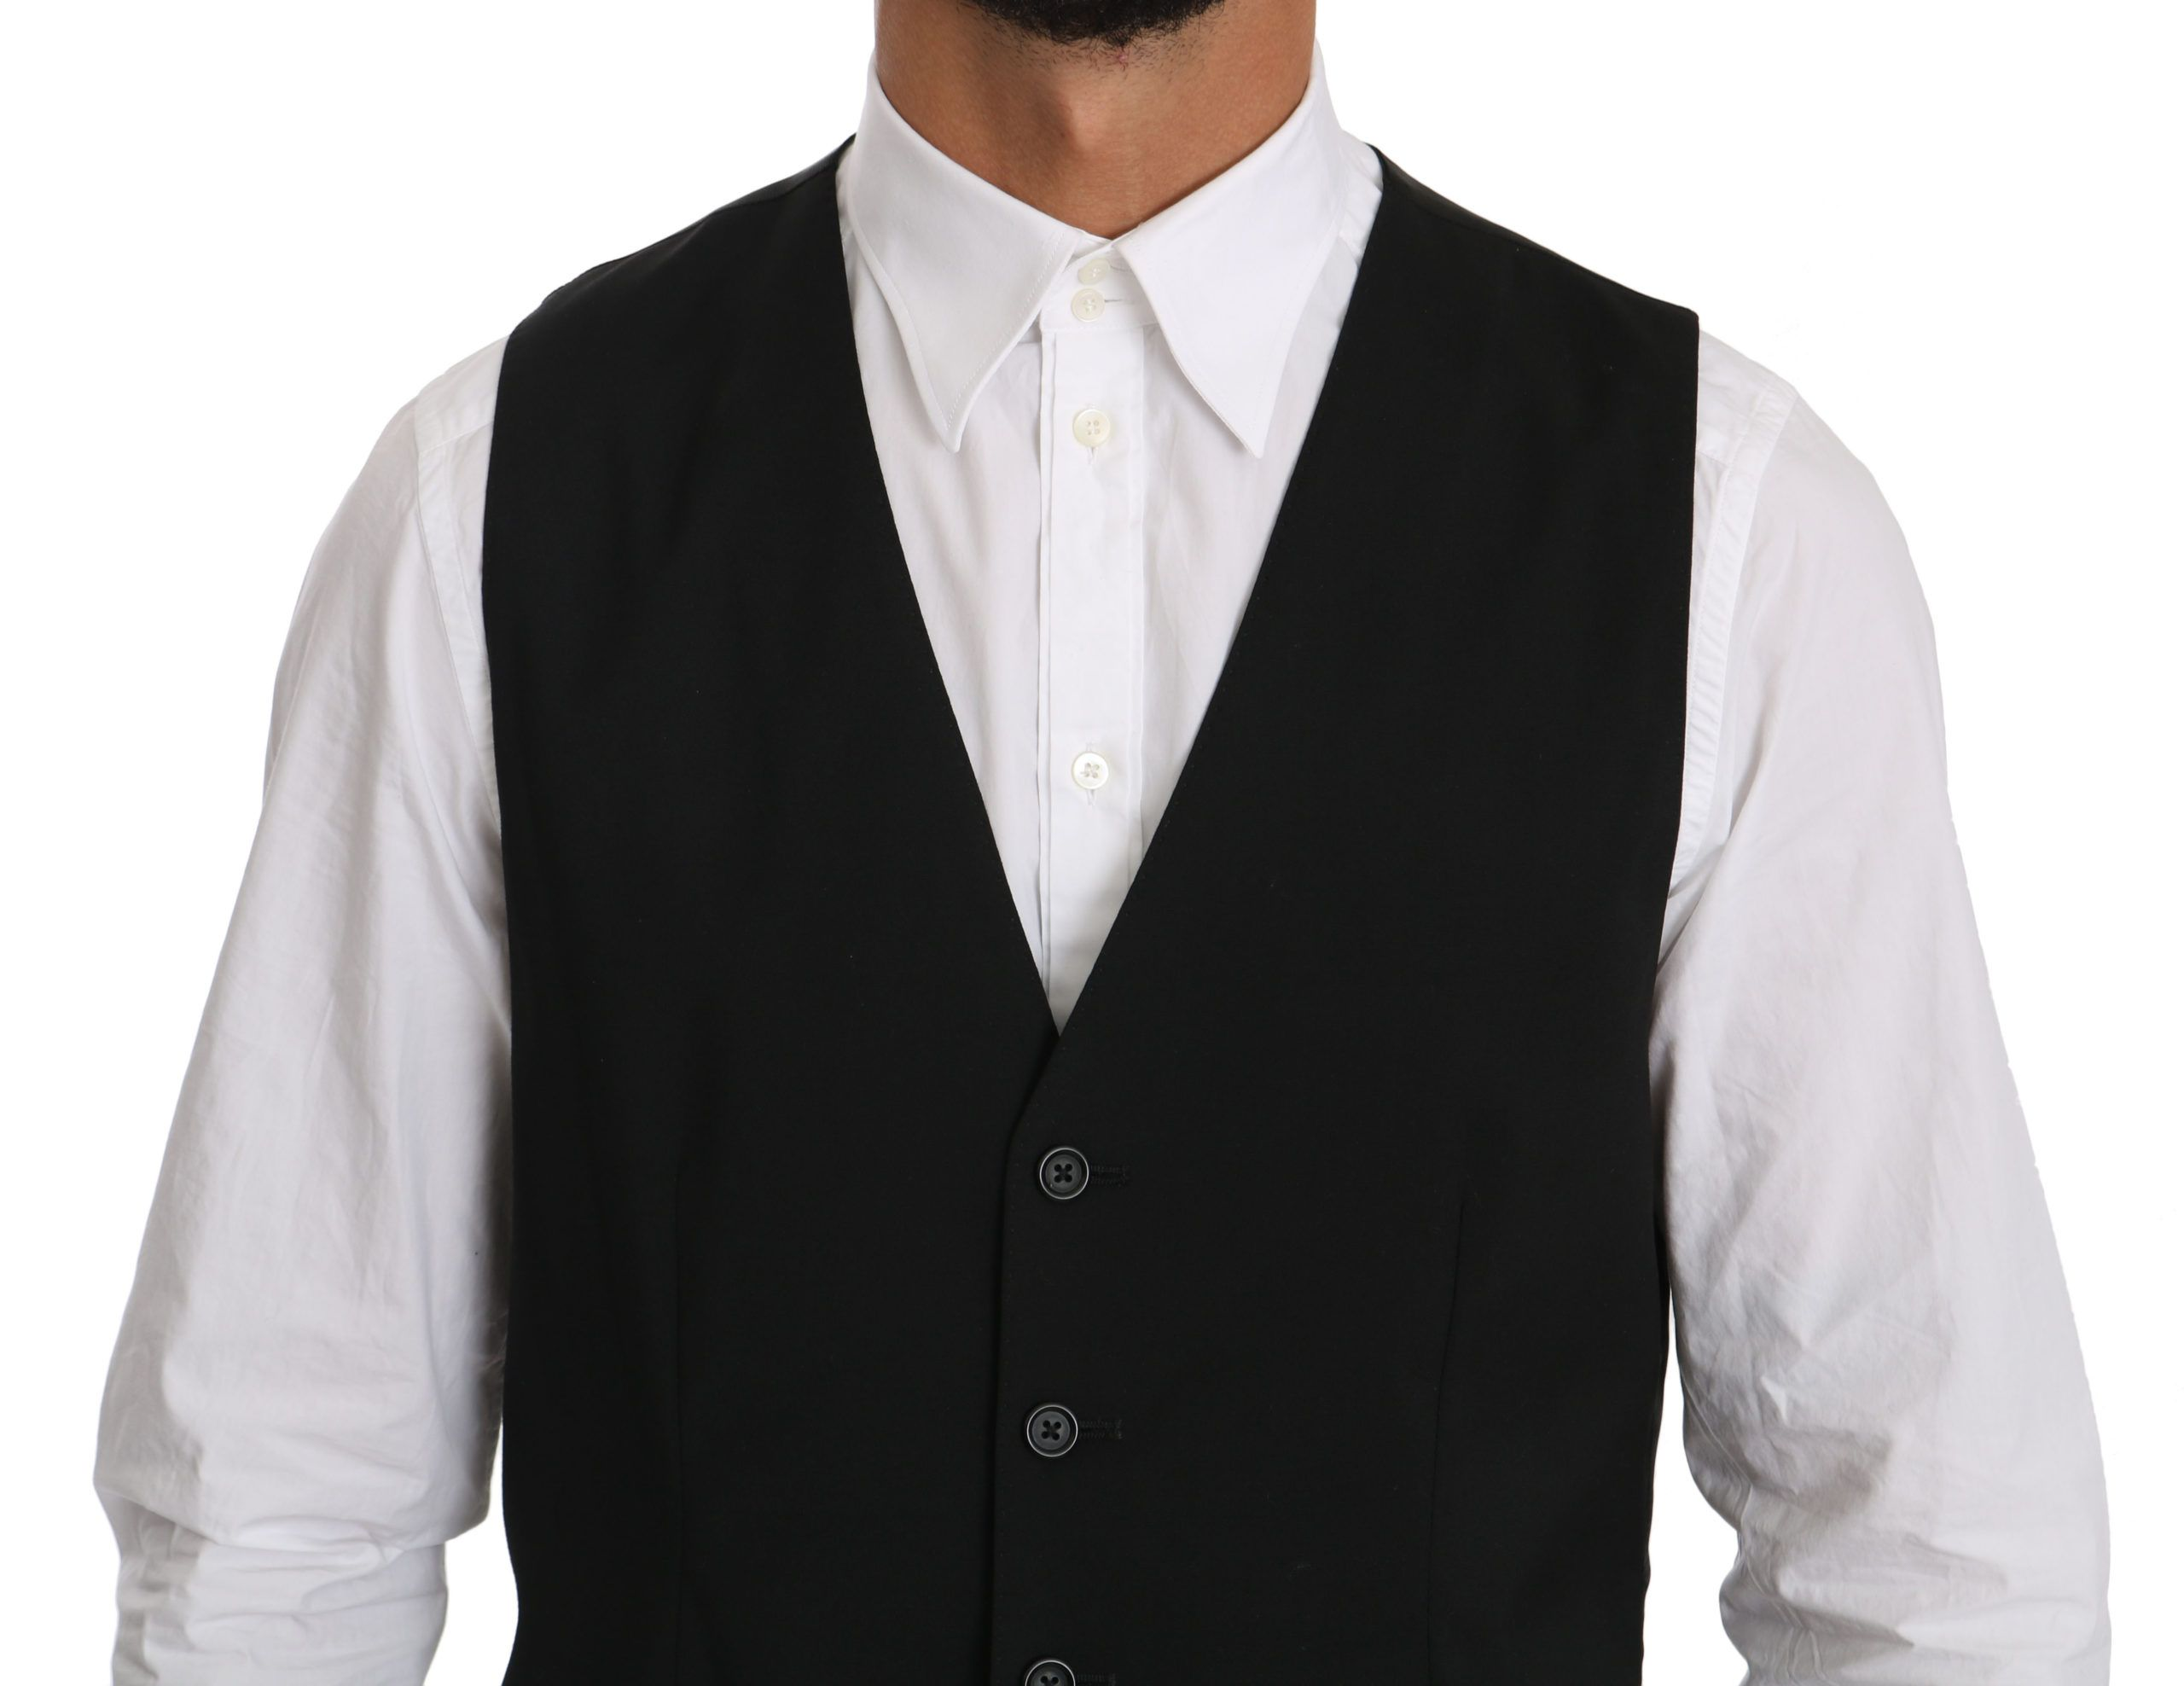 Dolce & Gabbana STAFF Black Waistcoat Formal Gilet Vest